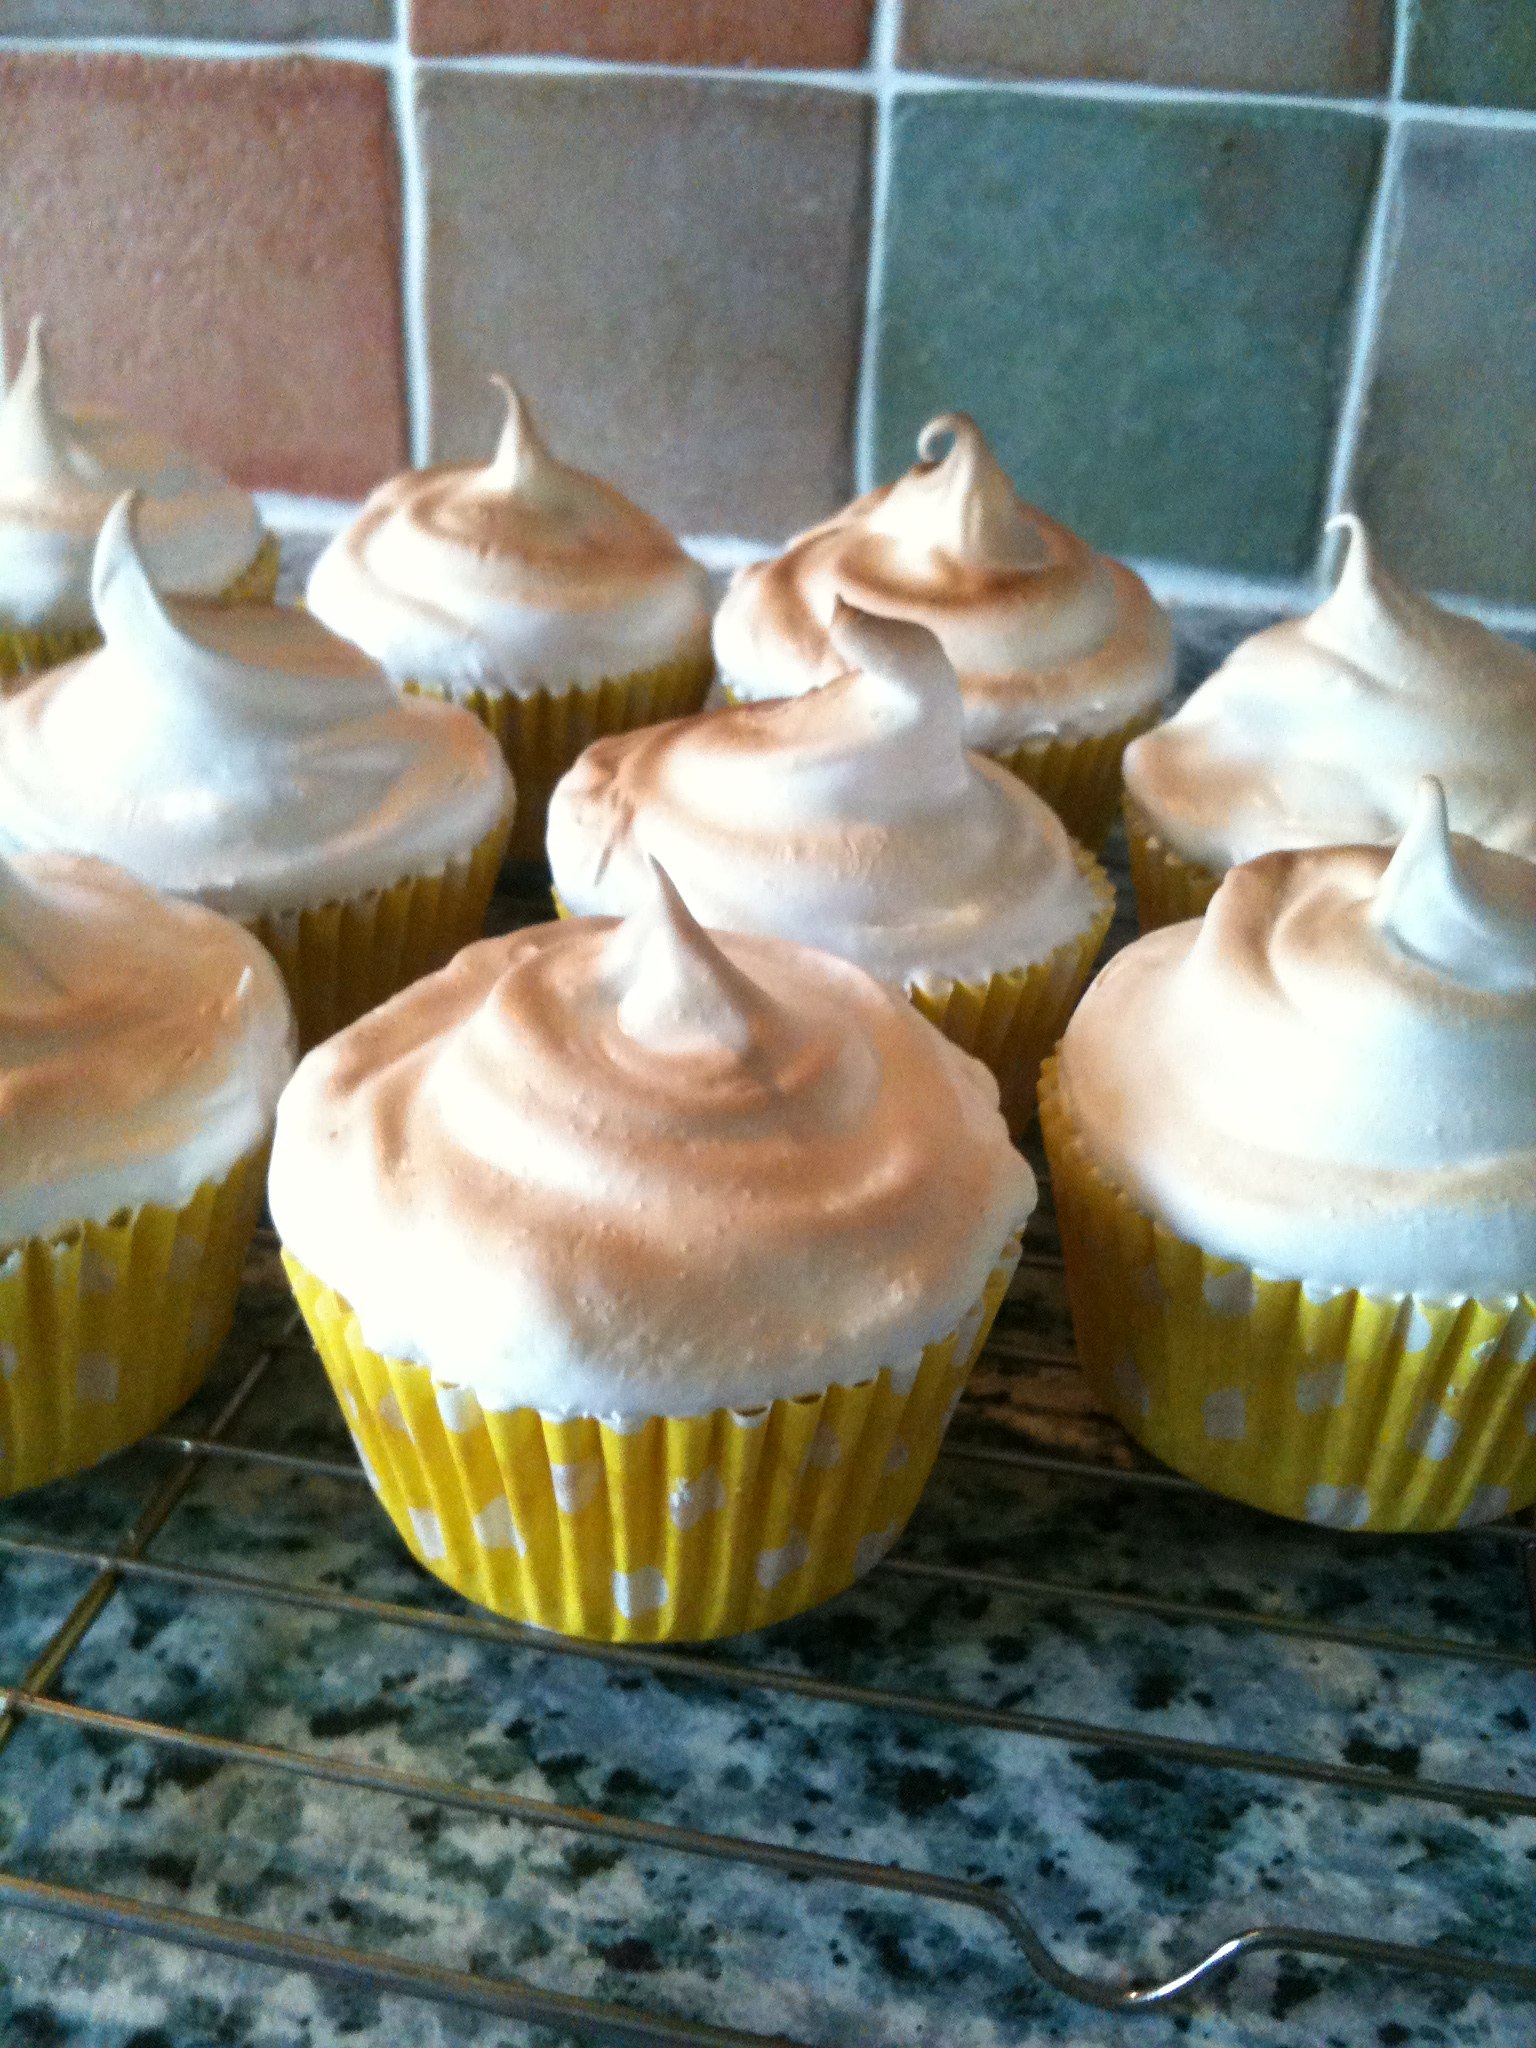 Abigall Brewster's lemon meringue cupcakes